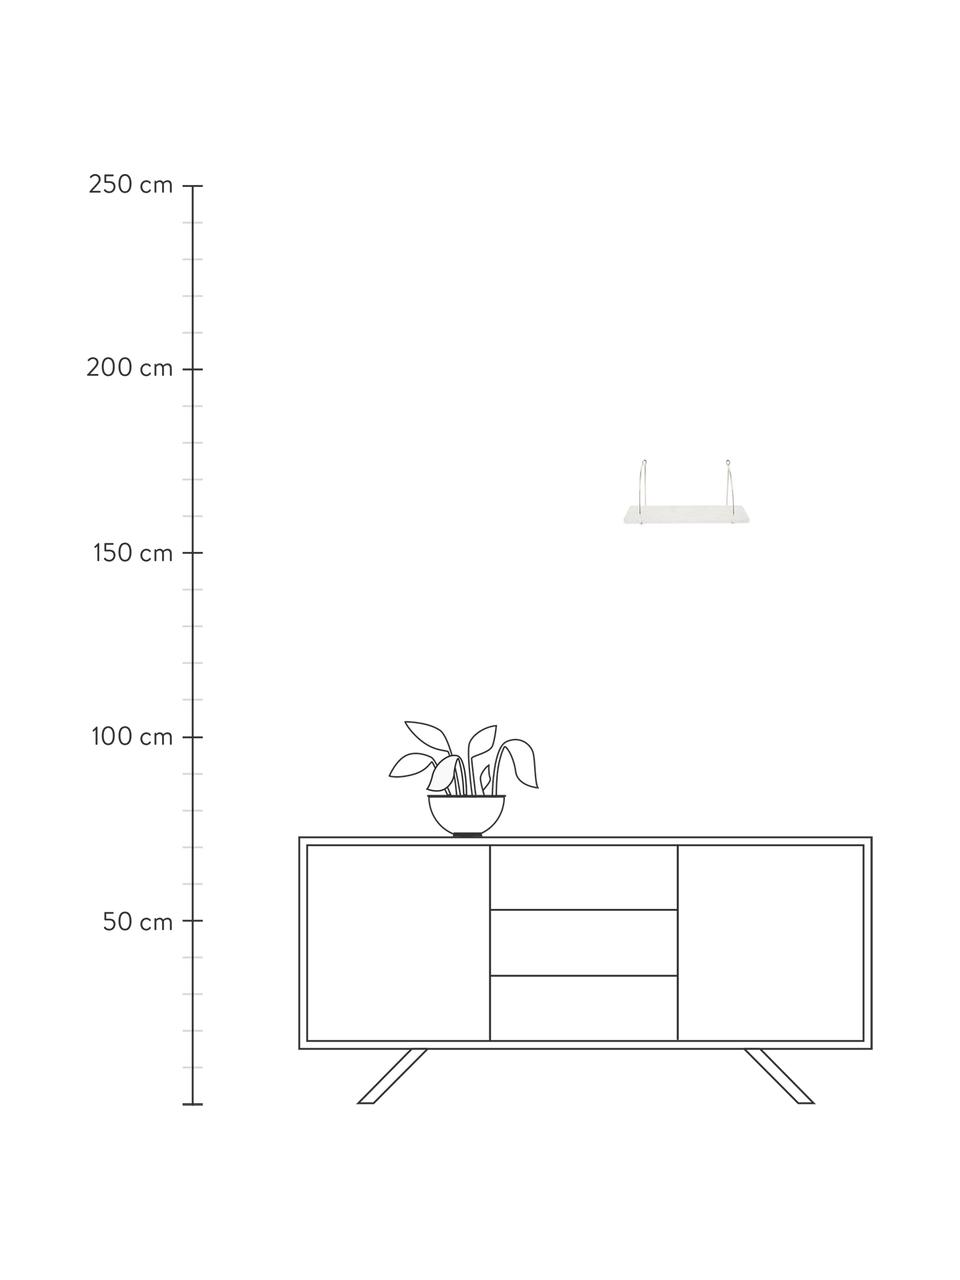 Marmor-Wandregal Porter, Regalboden: Marmor, Weißer Marmor, Edelstahl, 60 x 24 cm